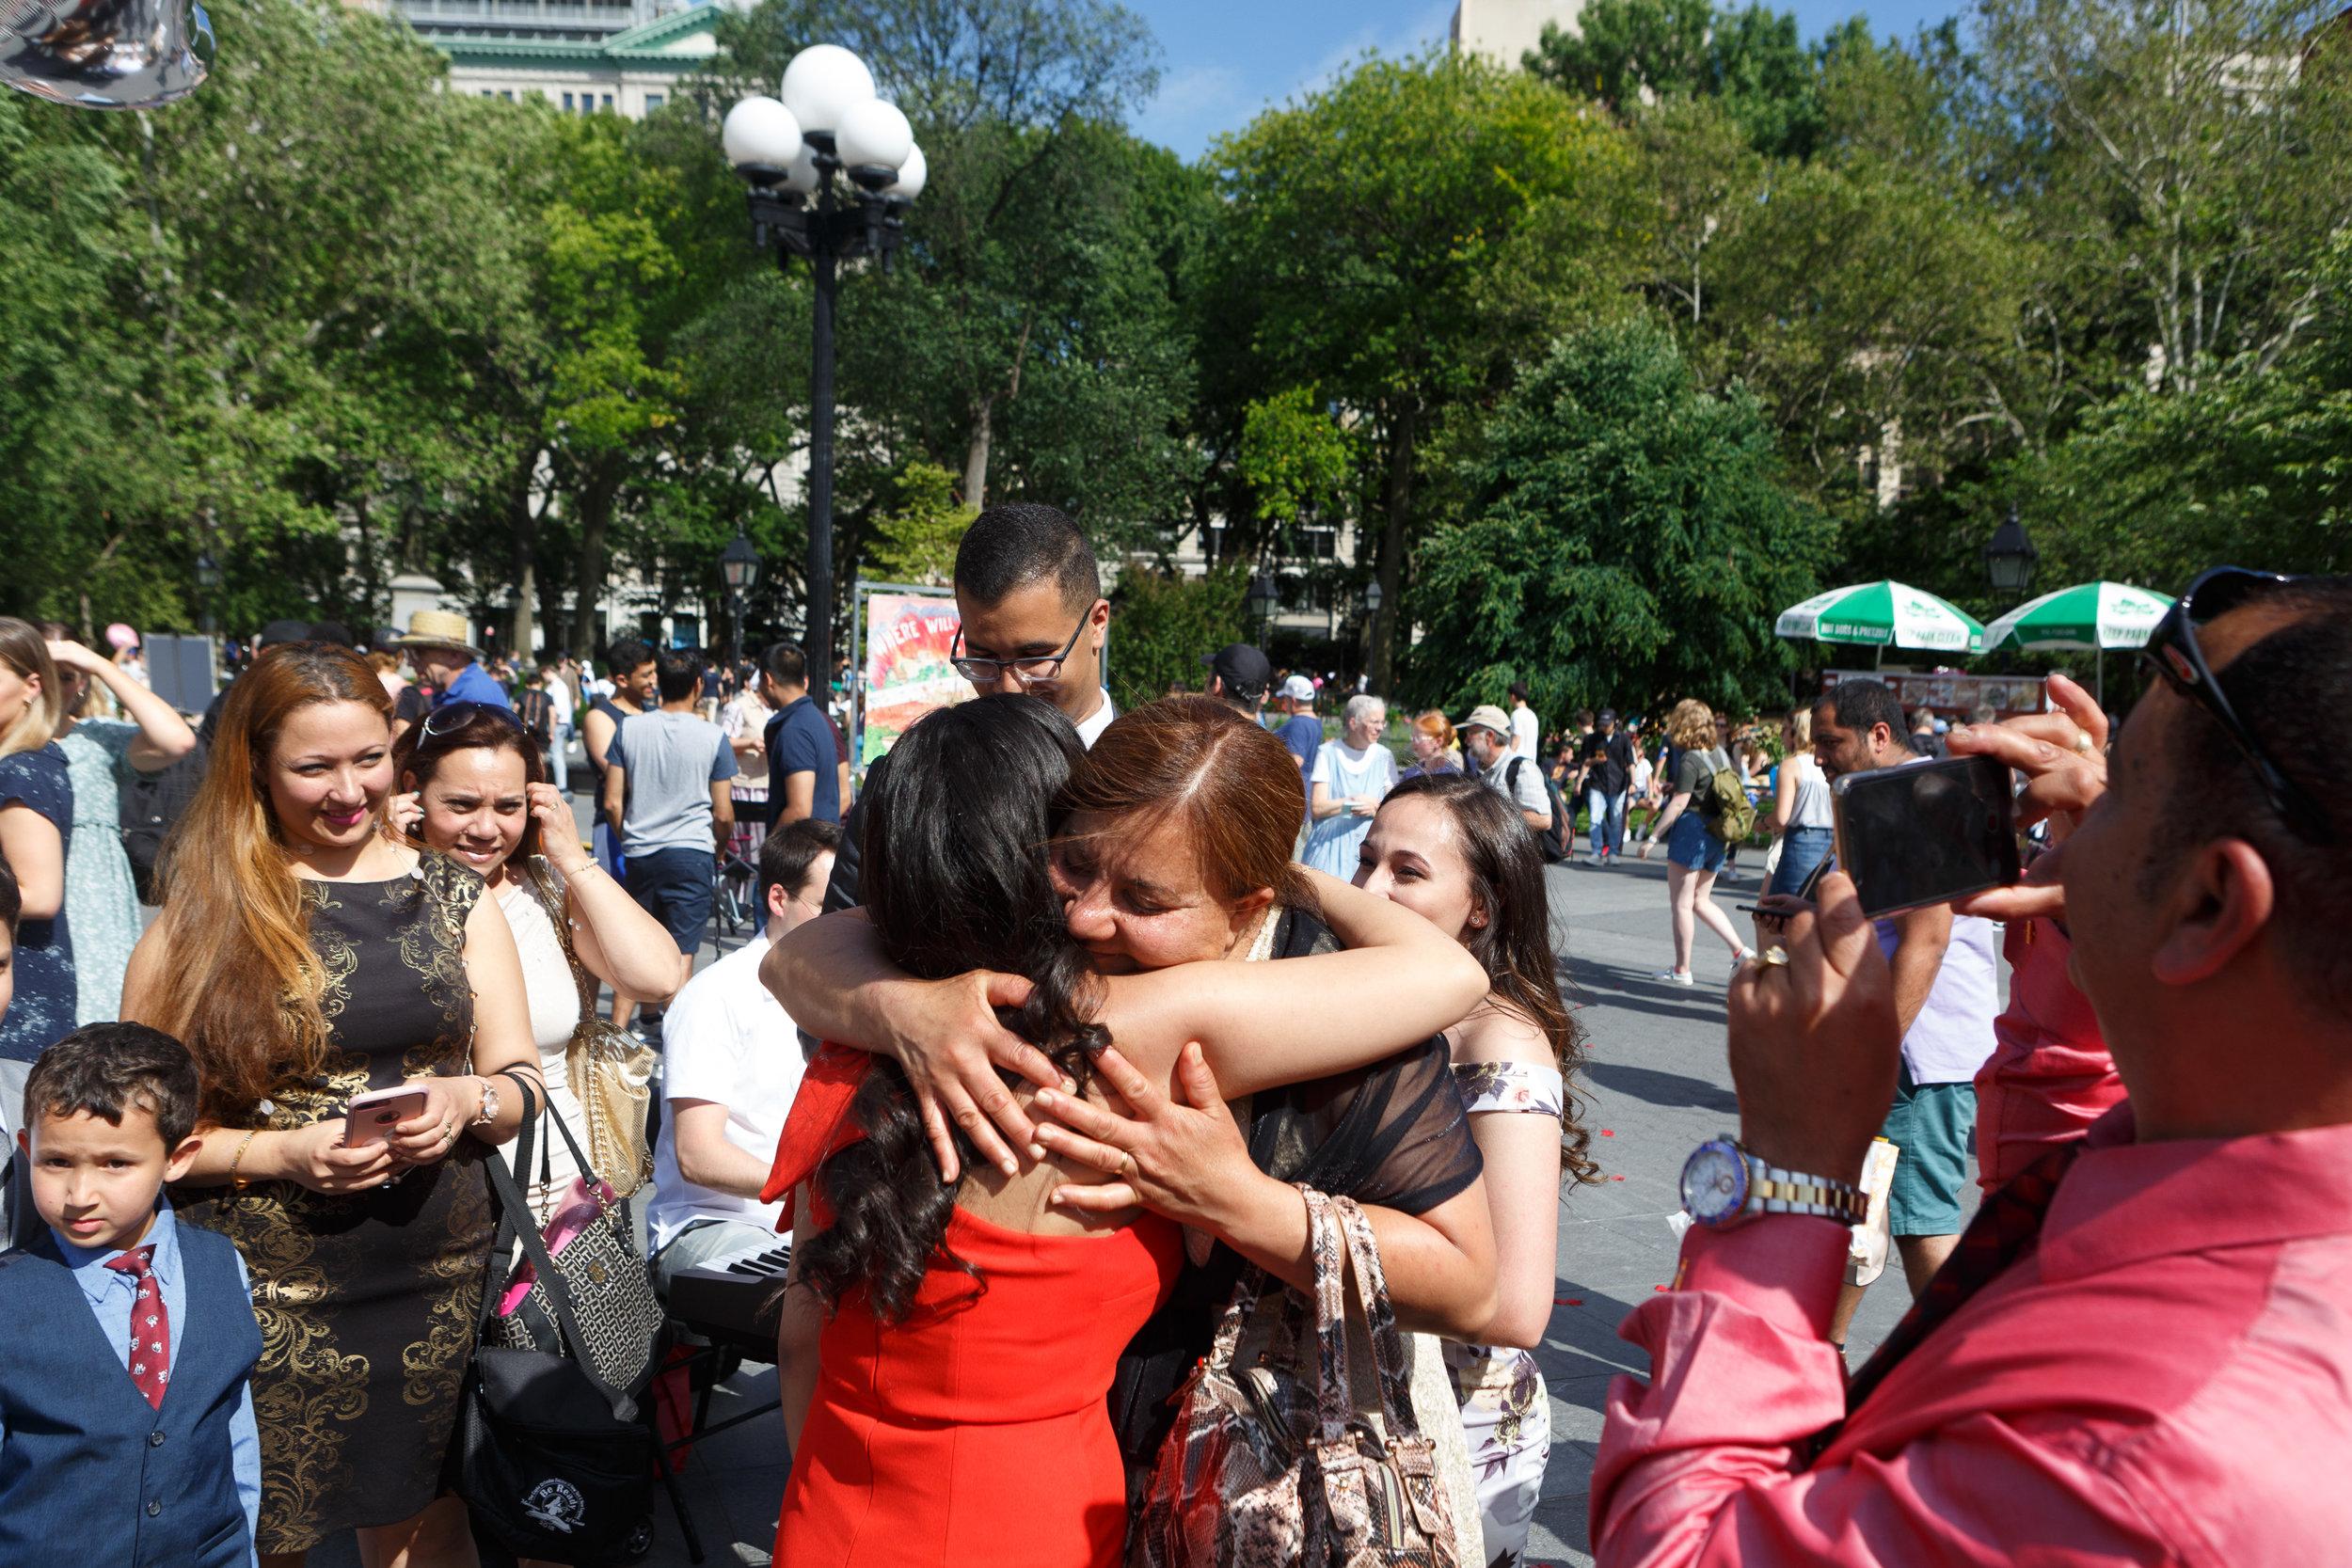 Kiro Rebecca Washington Square Park Marriage Proposal _ Jonathan Heisler _ 6152019 _028.jpg